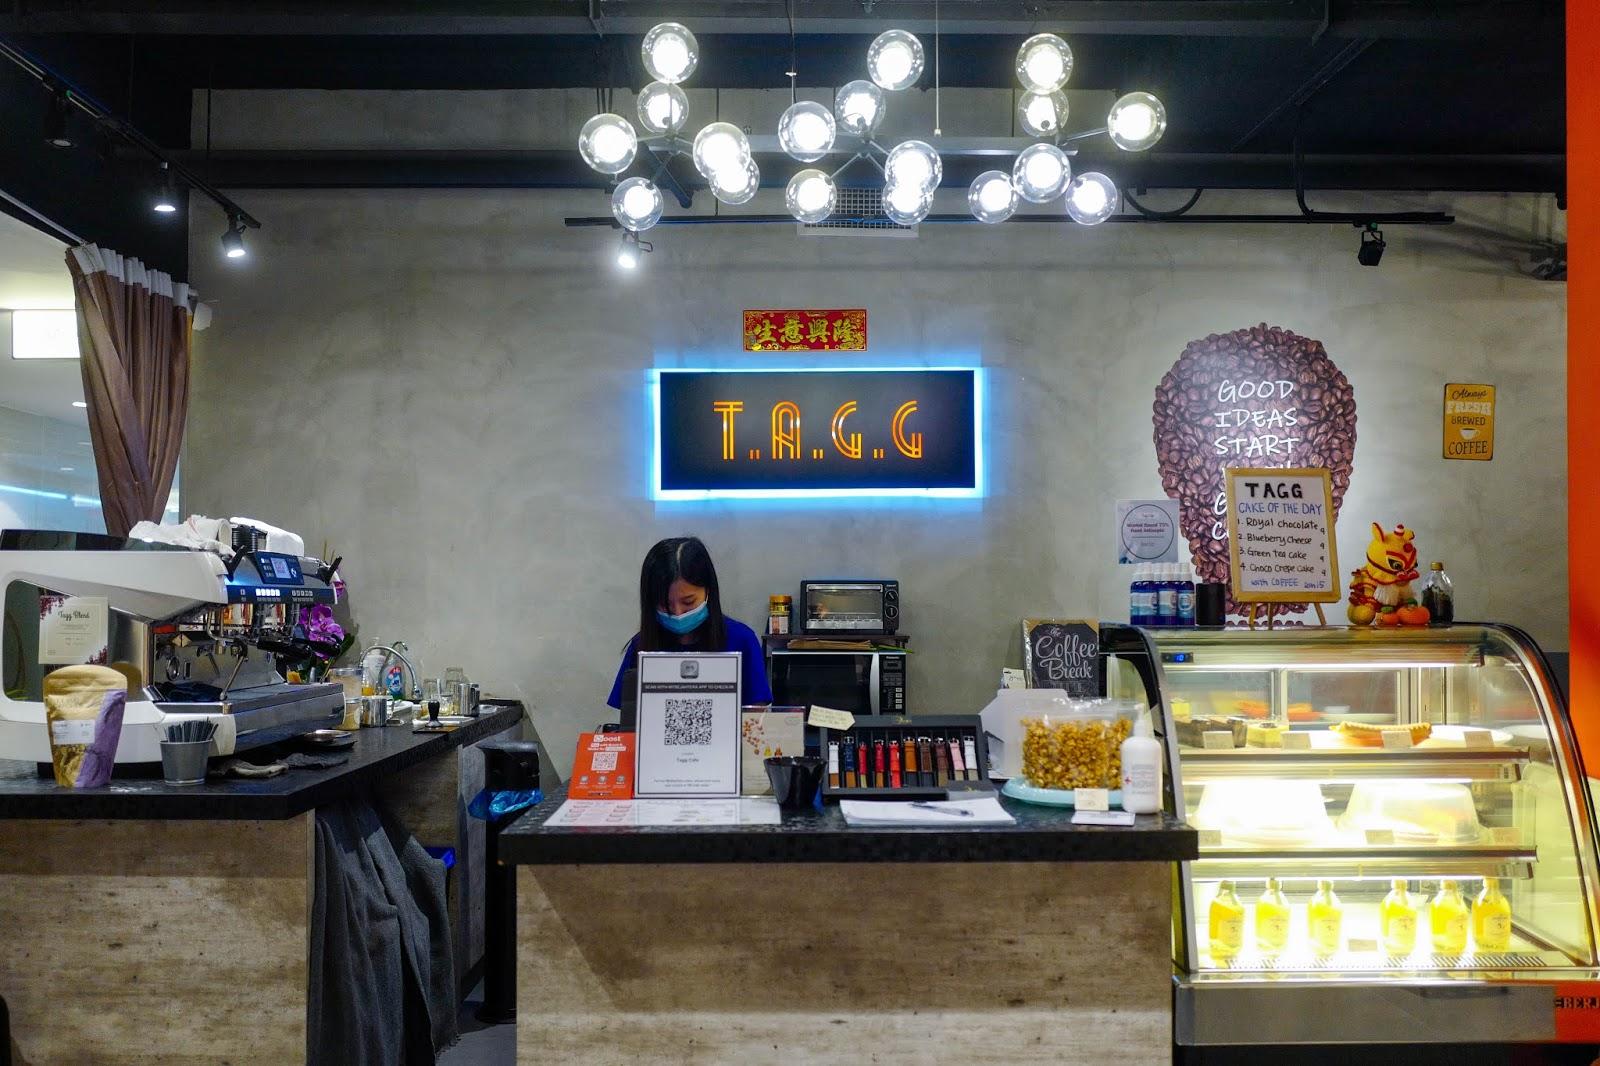 tagg cafe, wisma lim foo yong